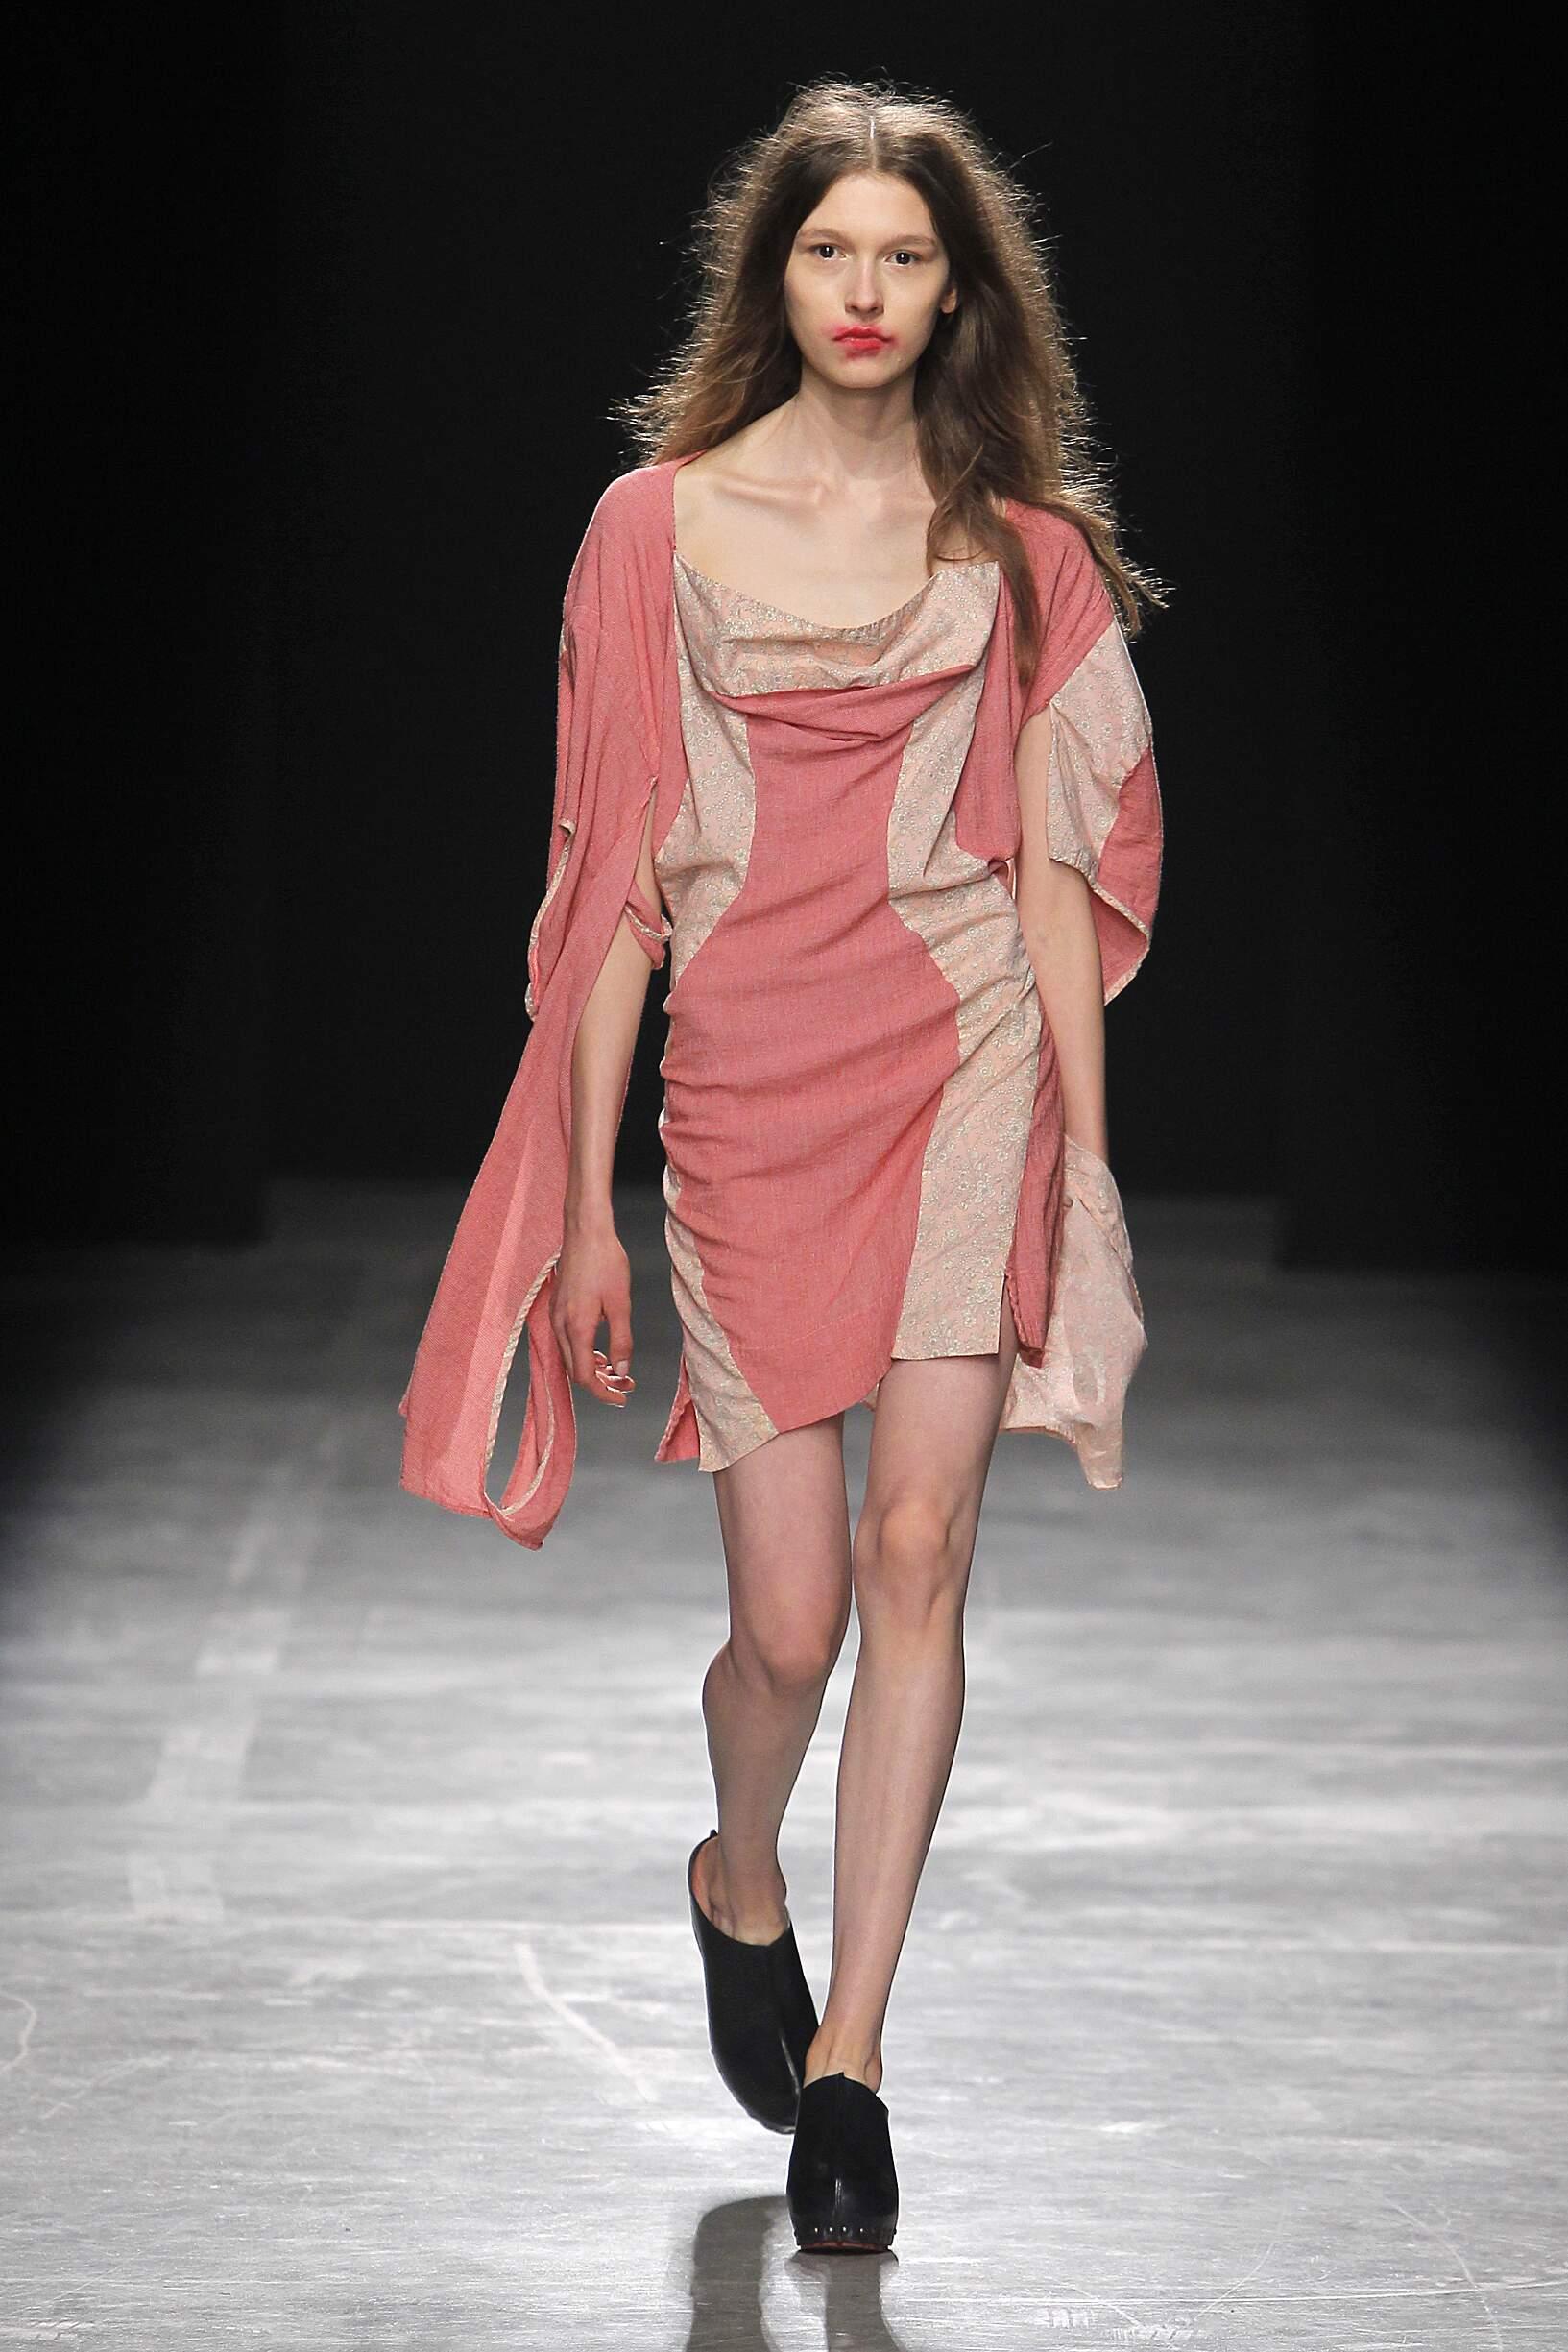 Summer 2017 Fashion Trends Andreas Kronthaler for Vivienne Westwood